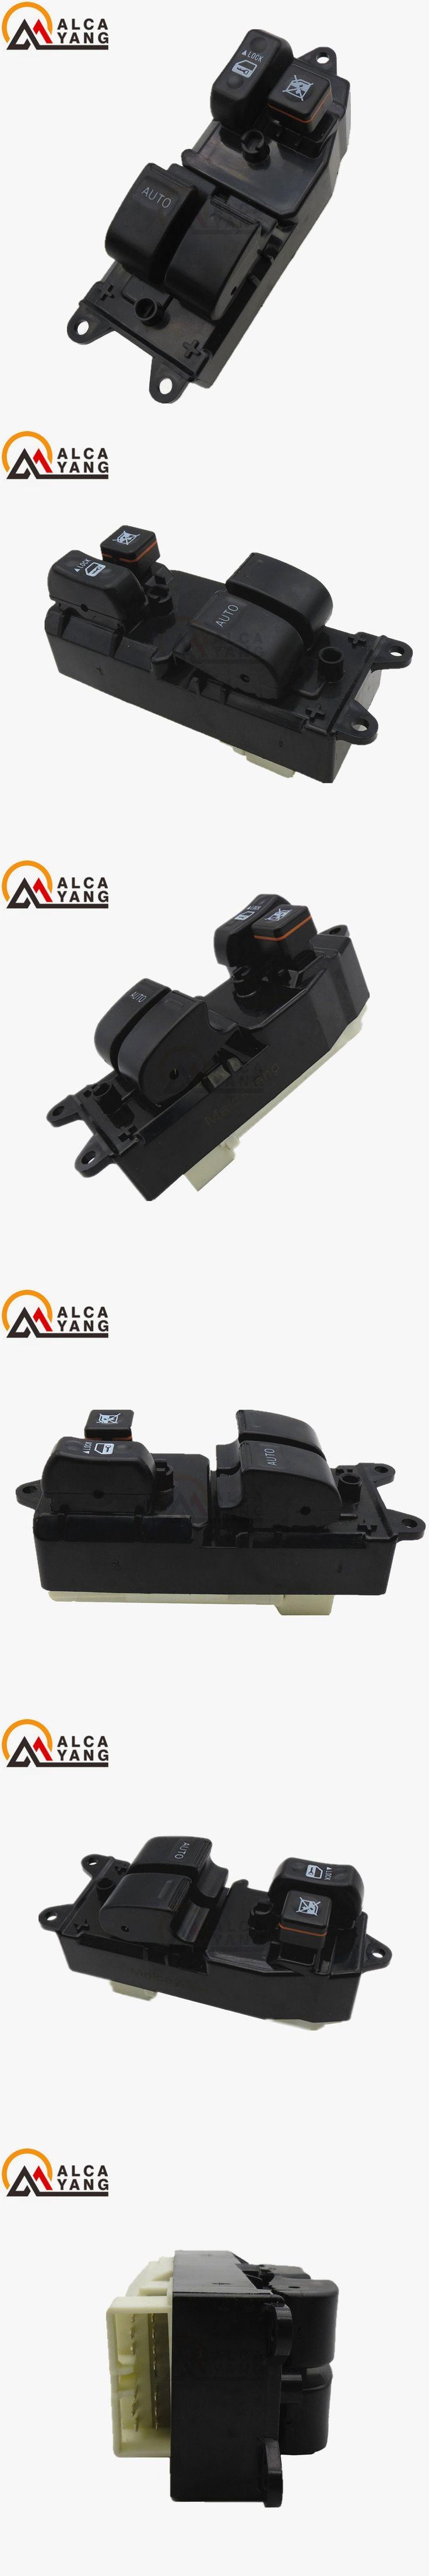 New Power Window Master Switch Assy For Toyota Echo Verso Yaris